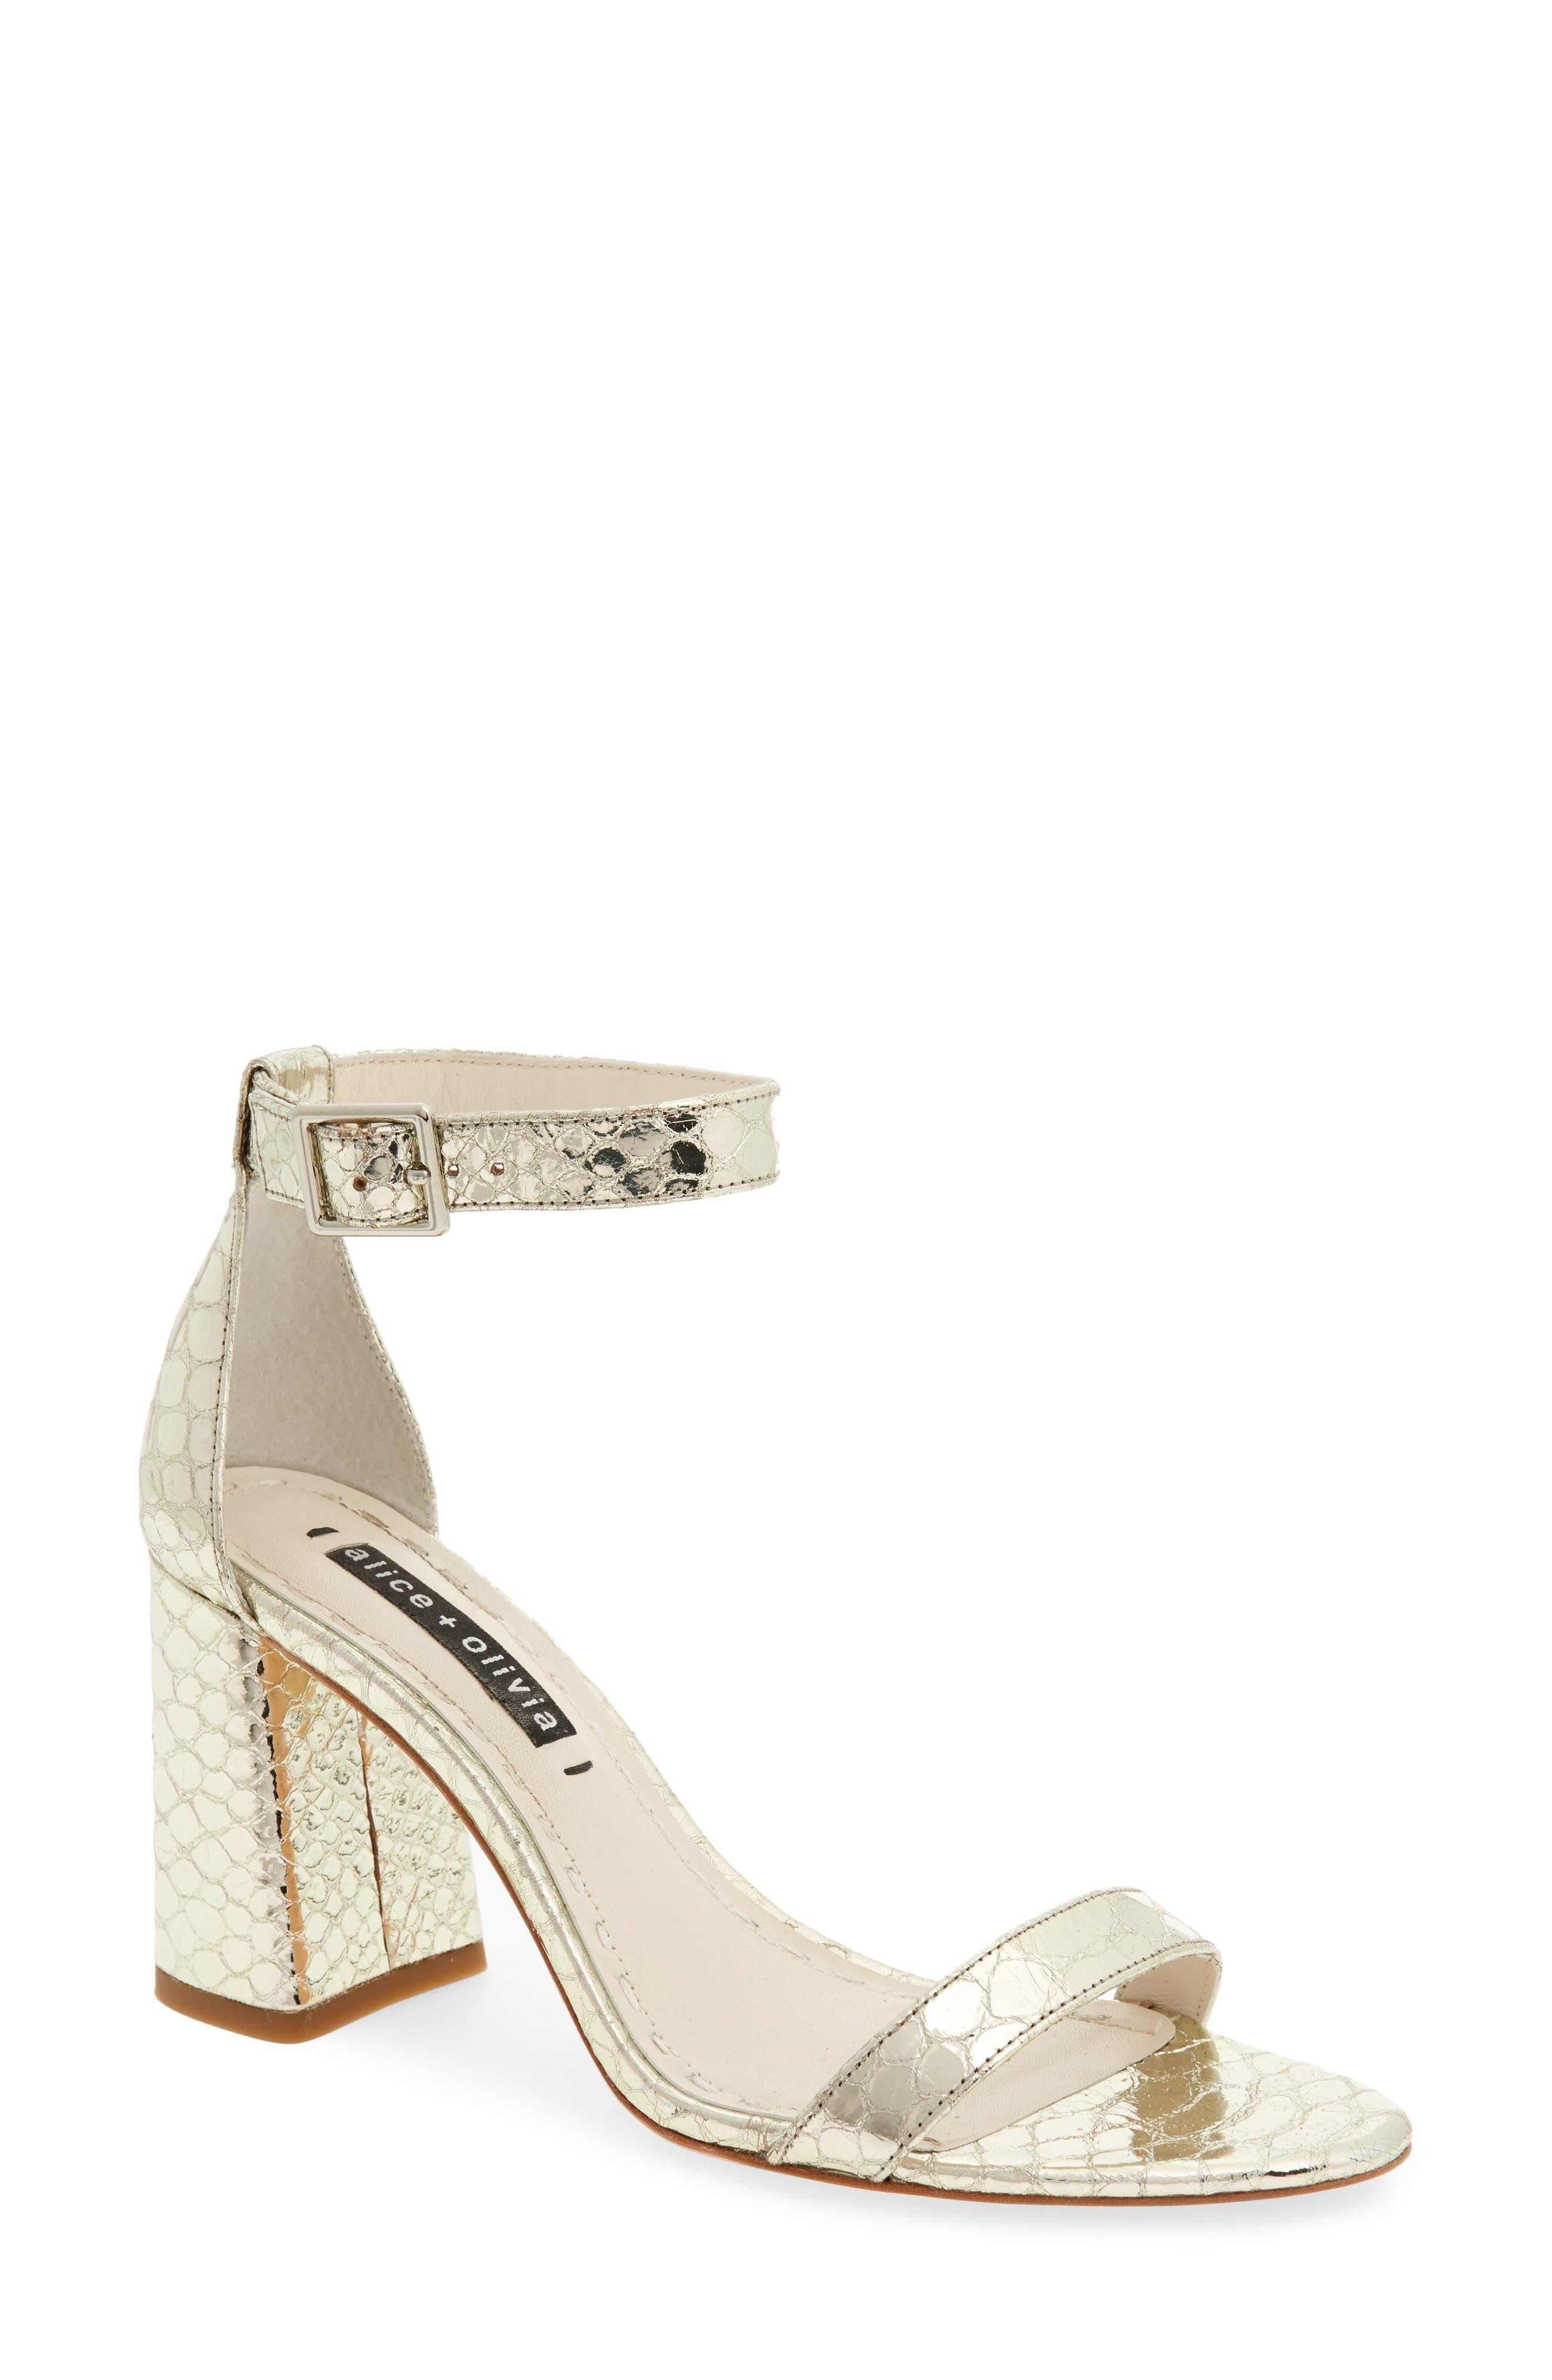 ALICE+OLIVIA Women's Lillian Ankle Strap Sandal